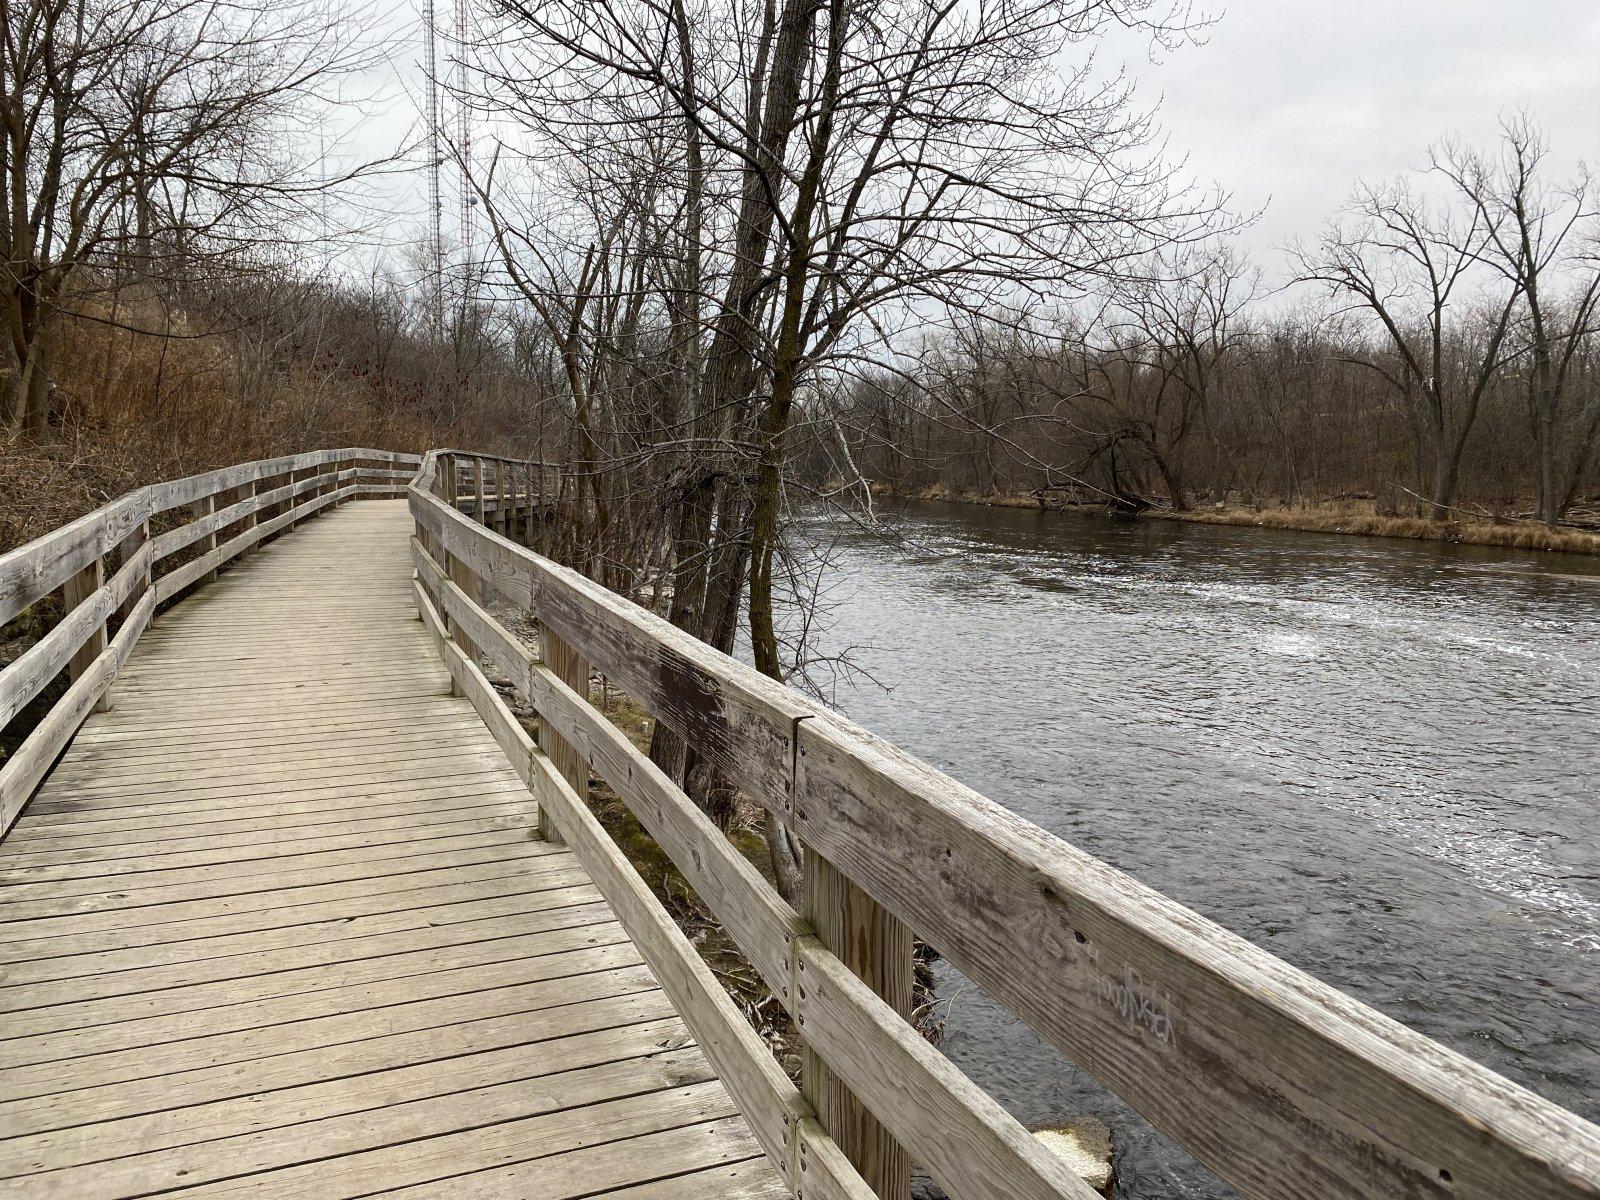 Bridge at the start of the walk